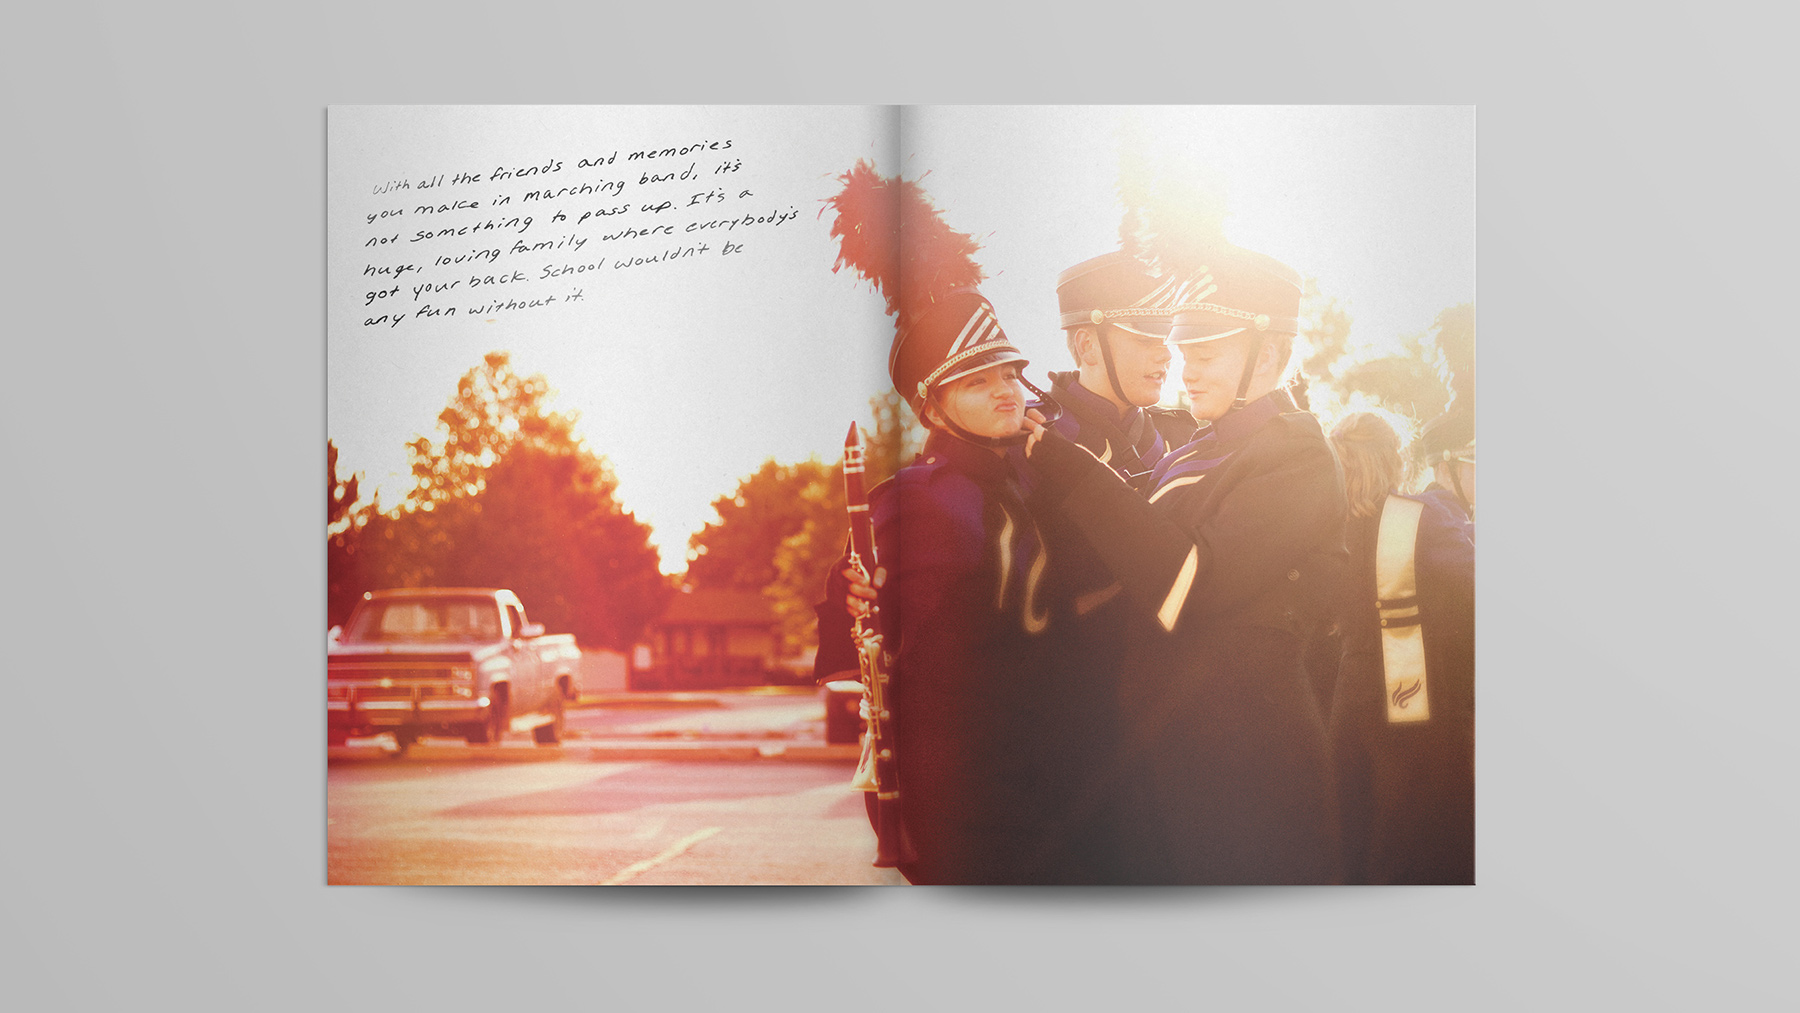 jajo-casestudy-fruhauf-lookbook-AA